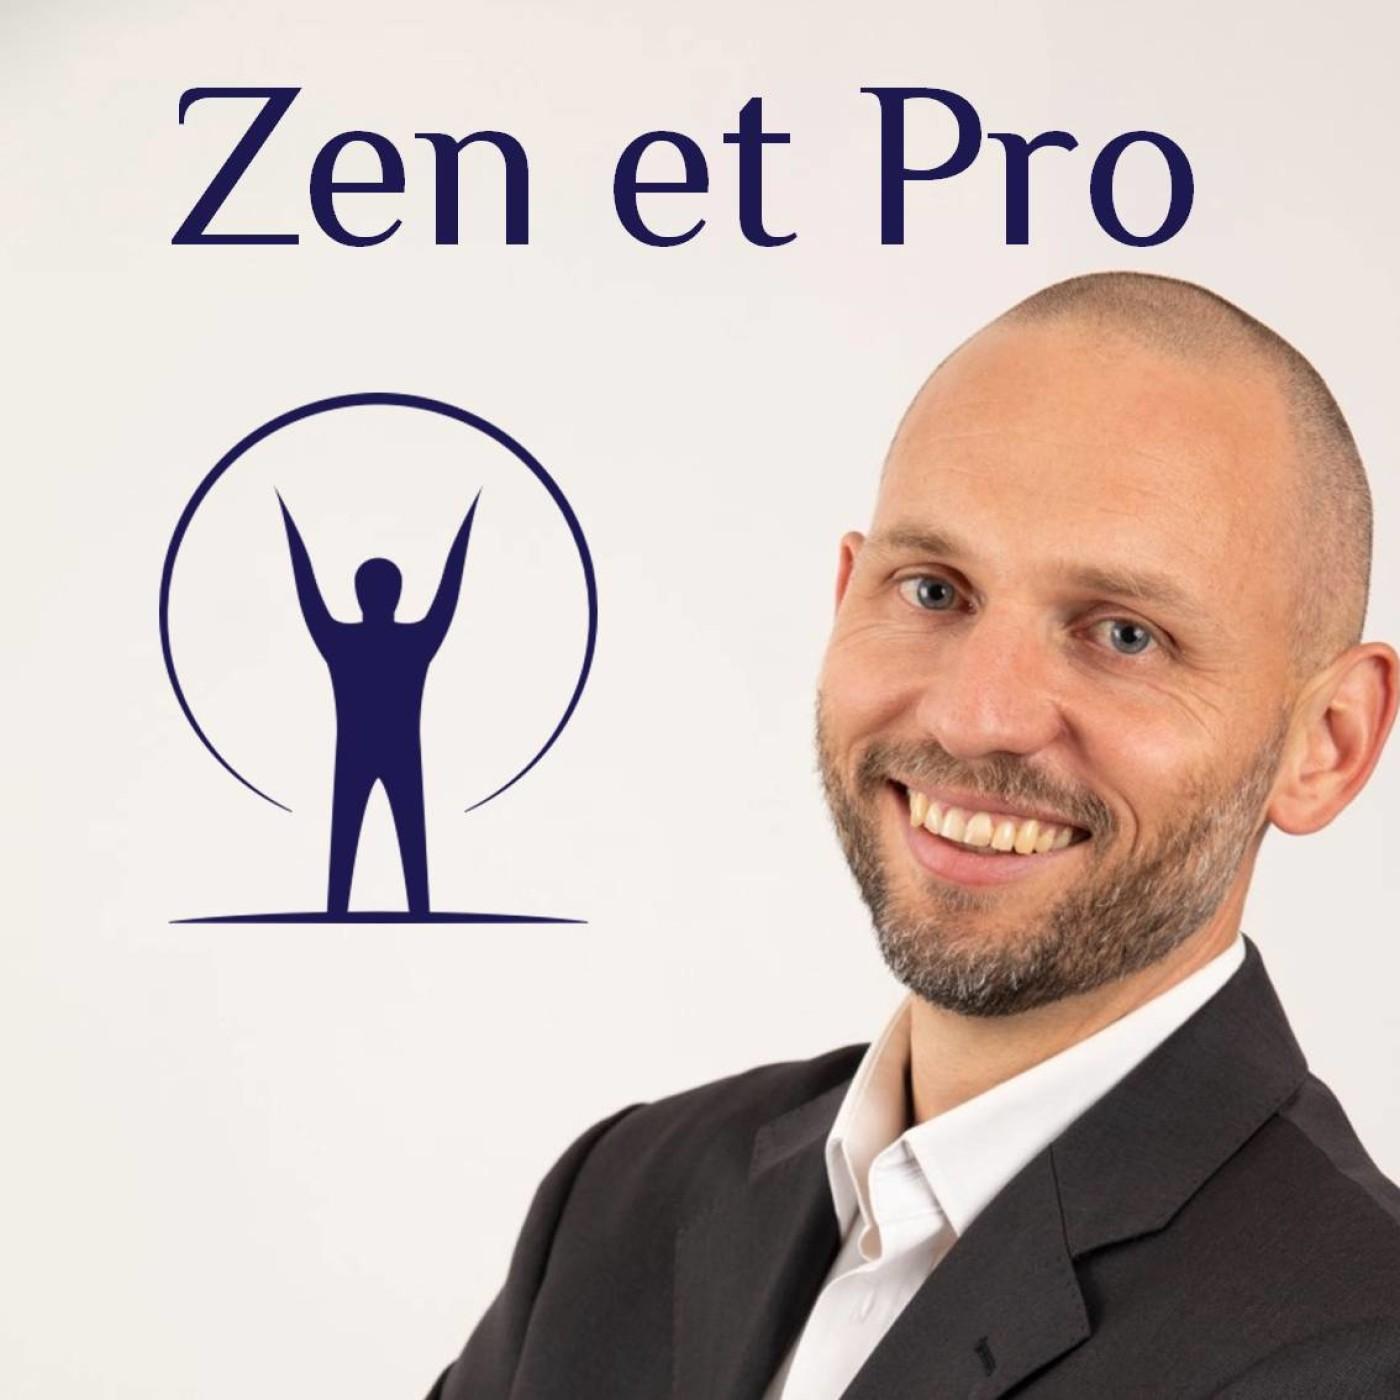 Zen et Pro